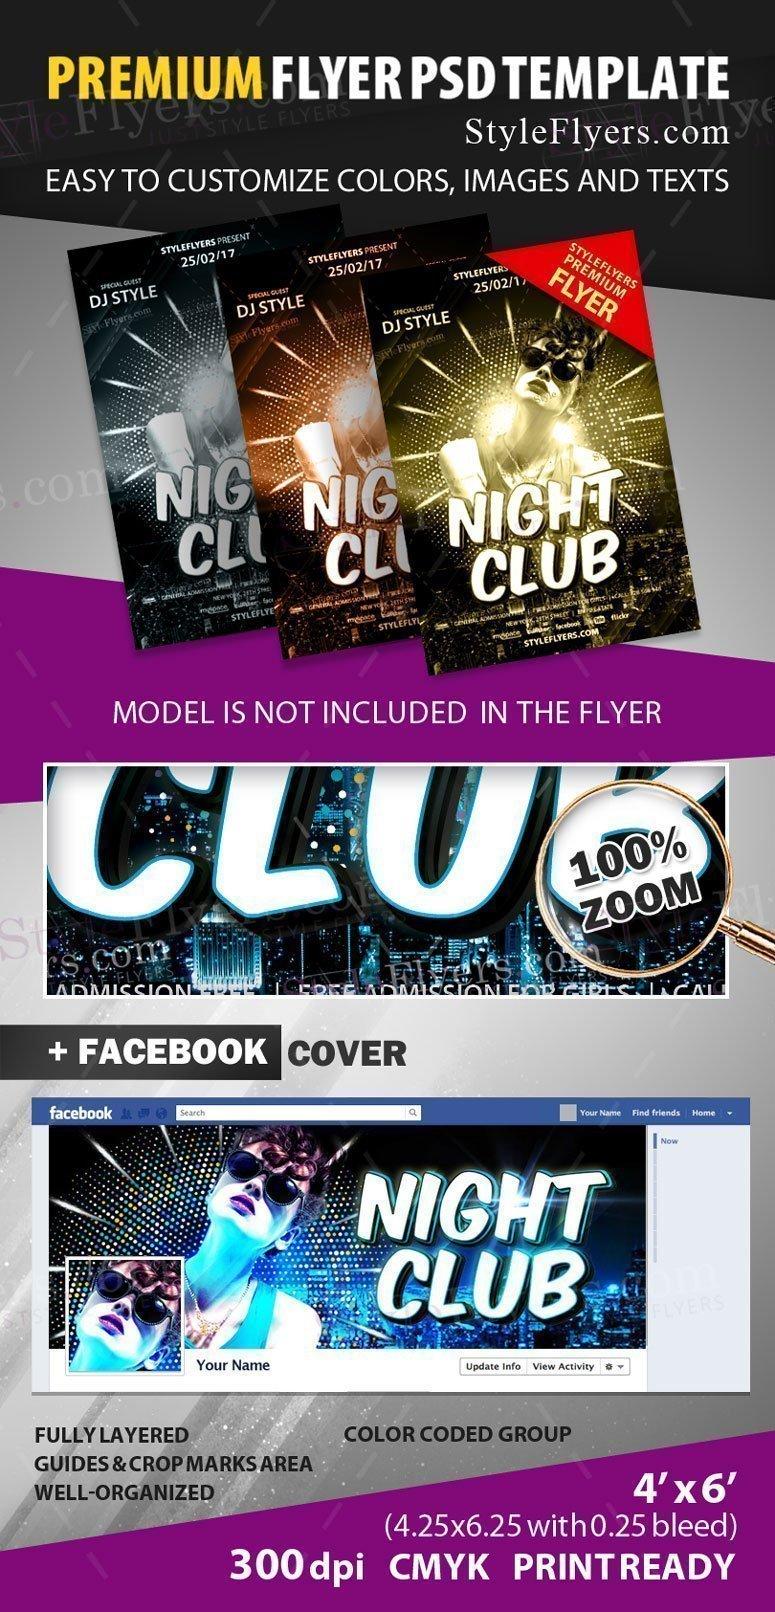 Night Club preview_premium